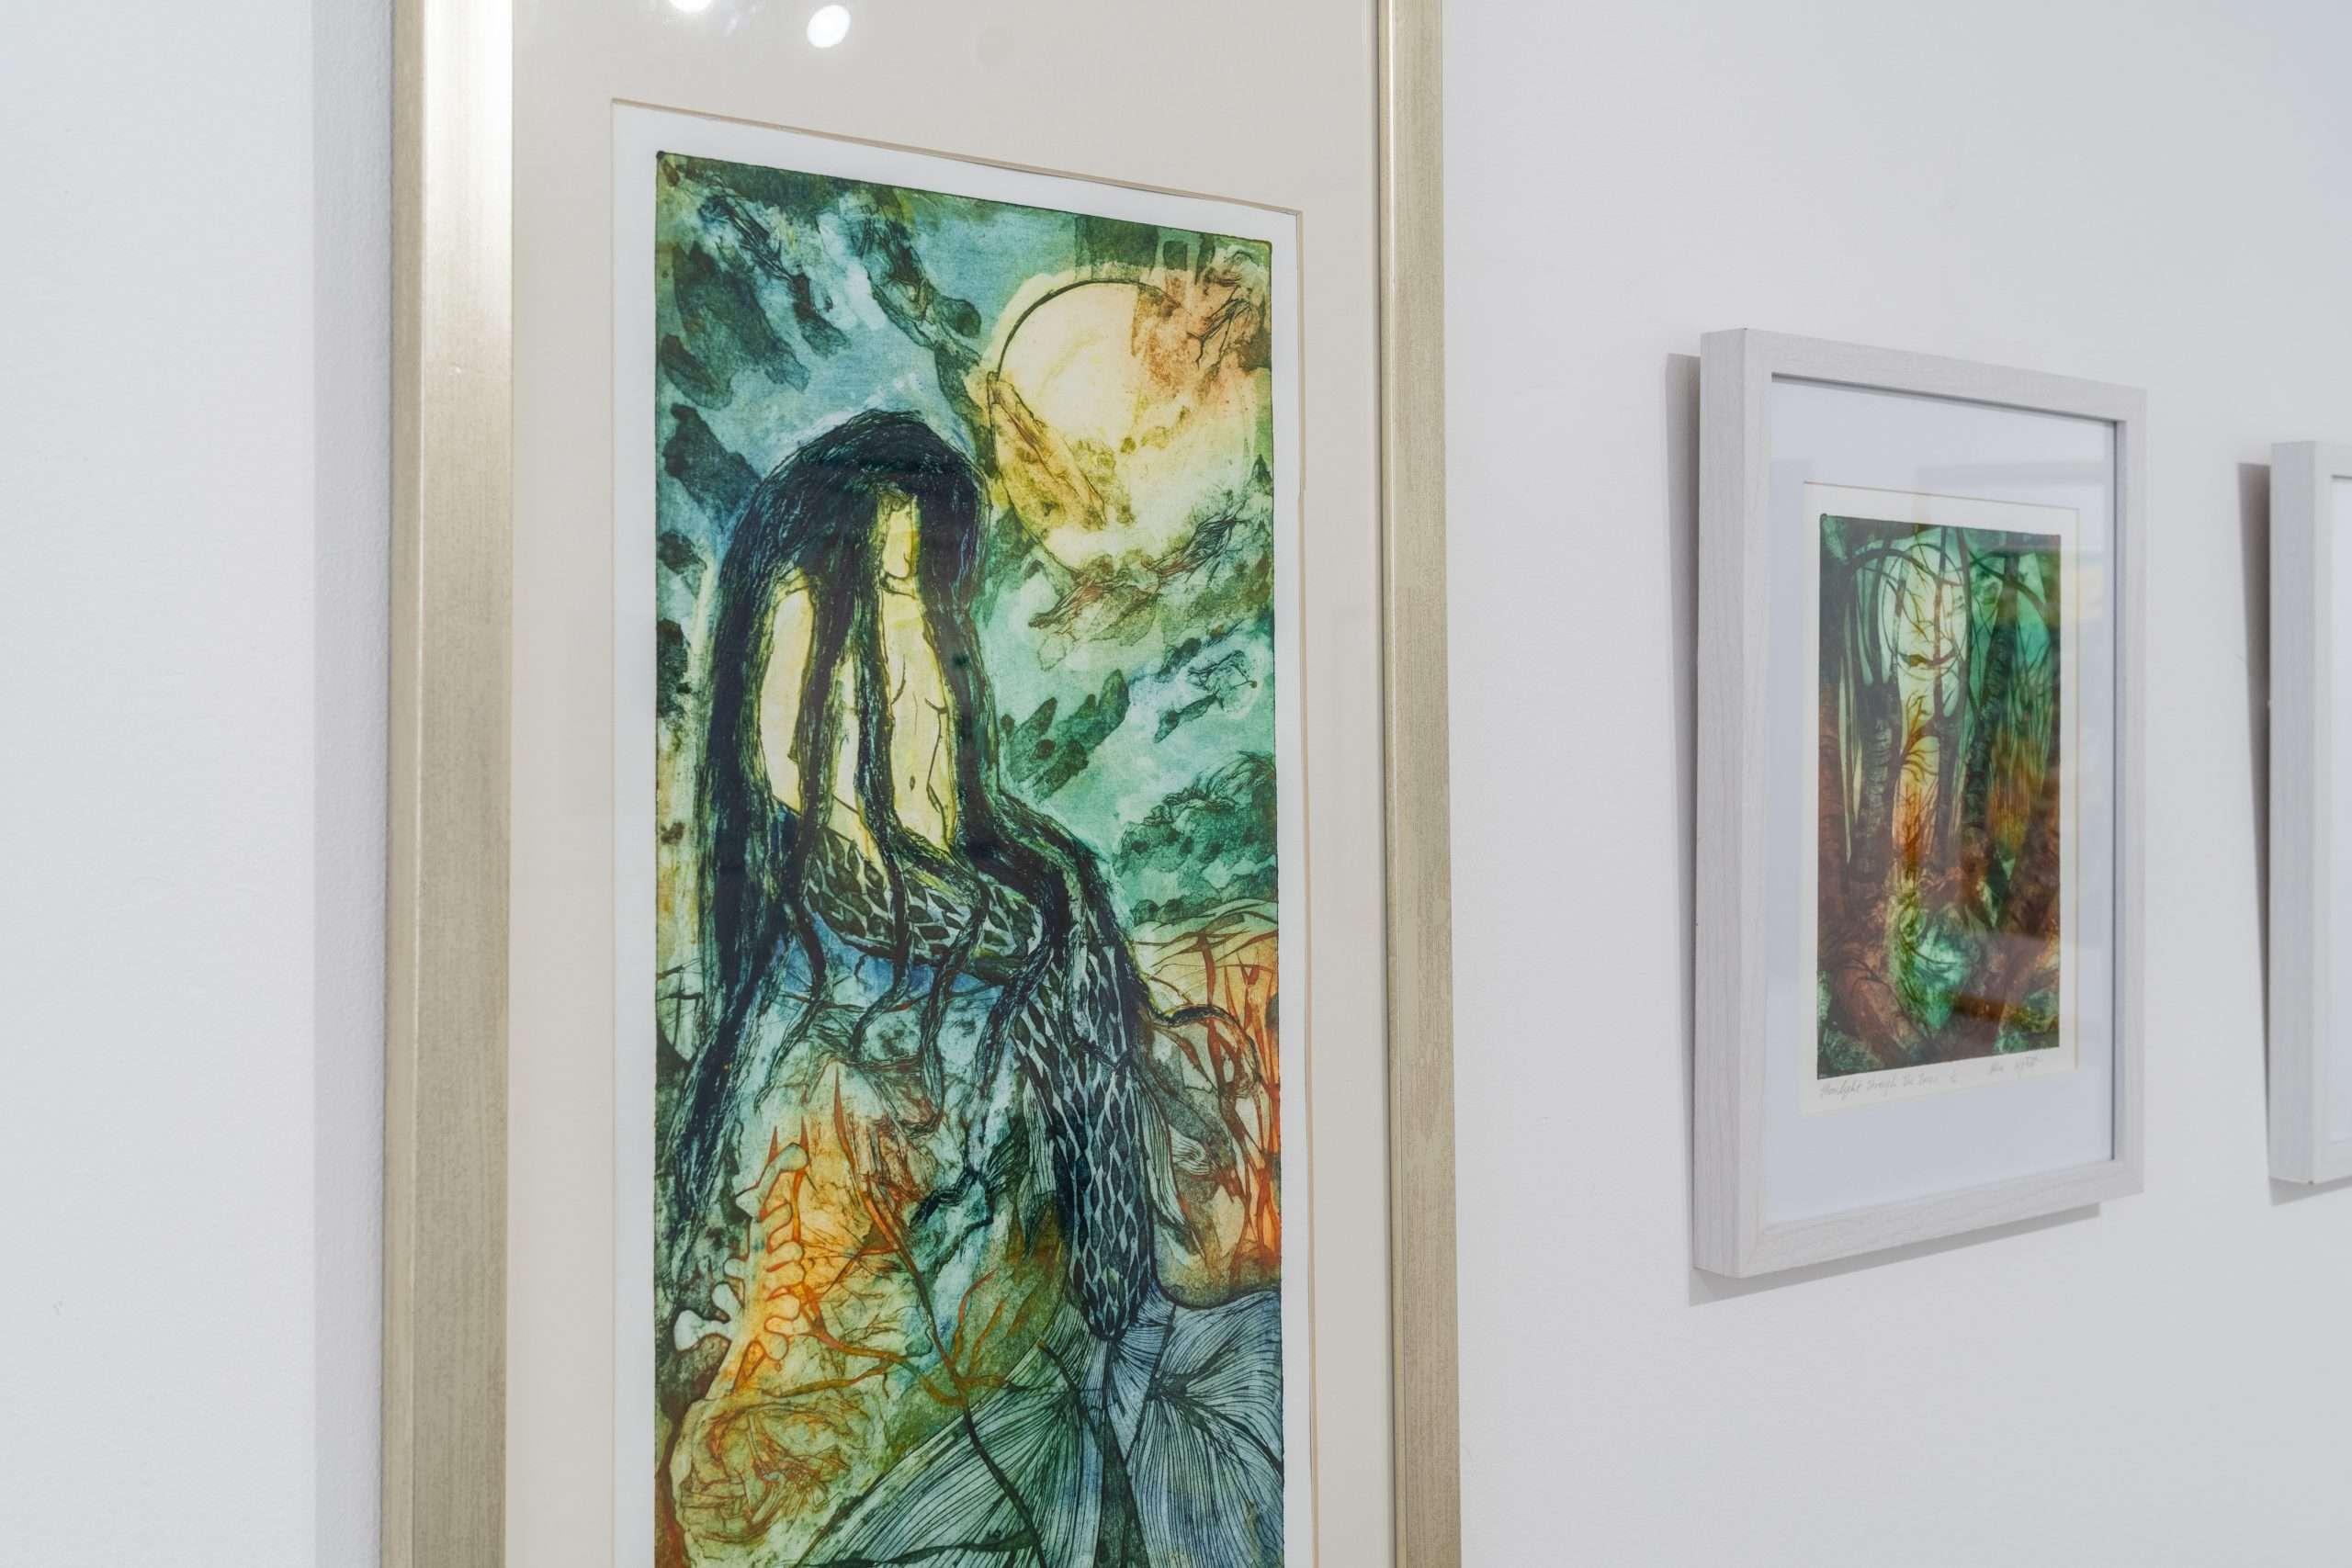 The Mermaid And The Dusky Moon by Alice Wyatt